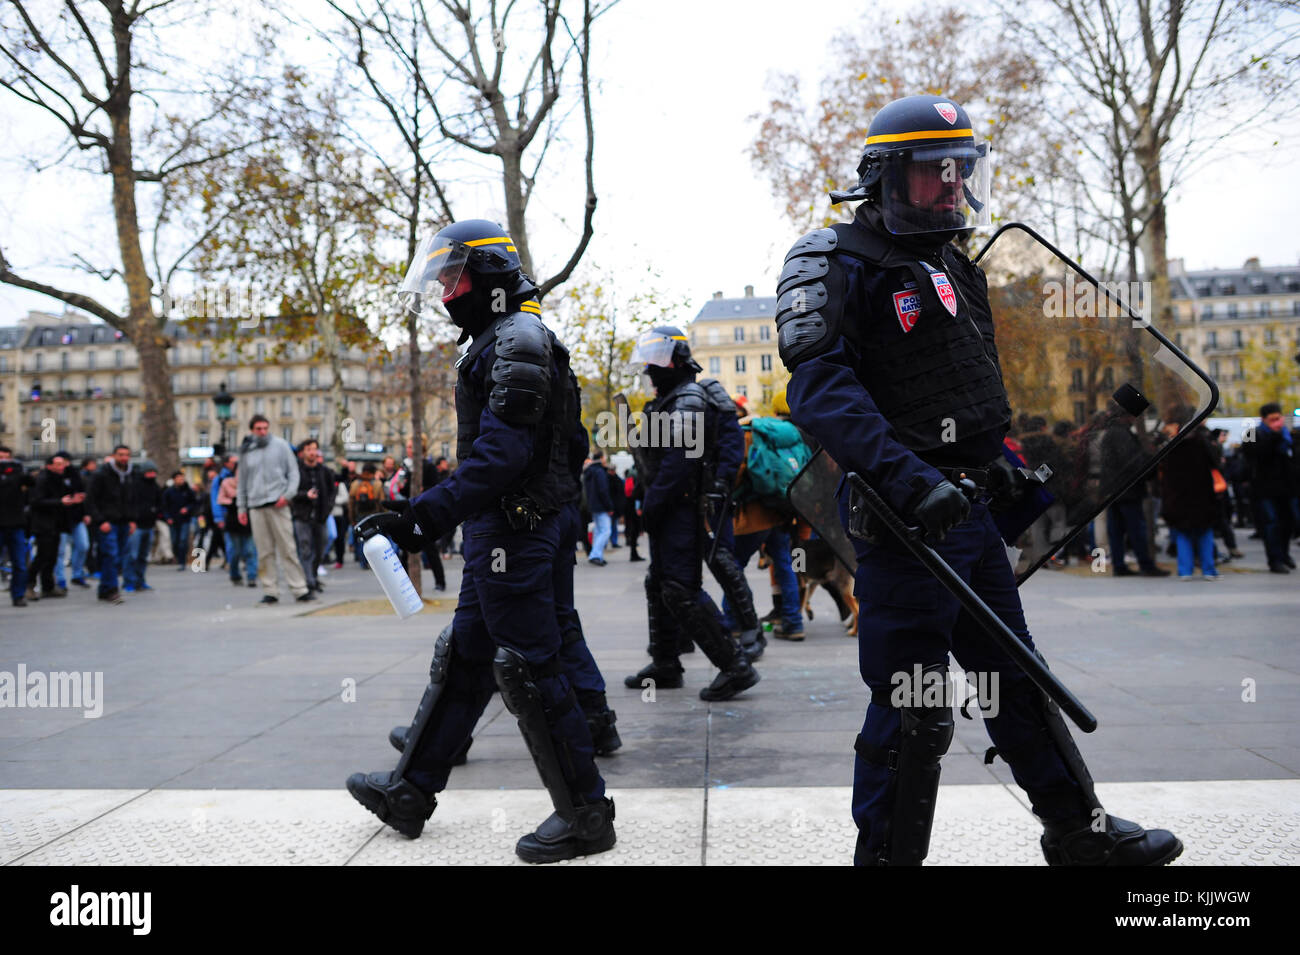 Riot police in Paris. France. - Stock Image